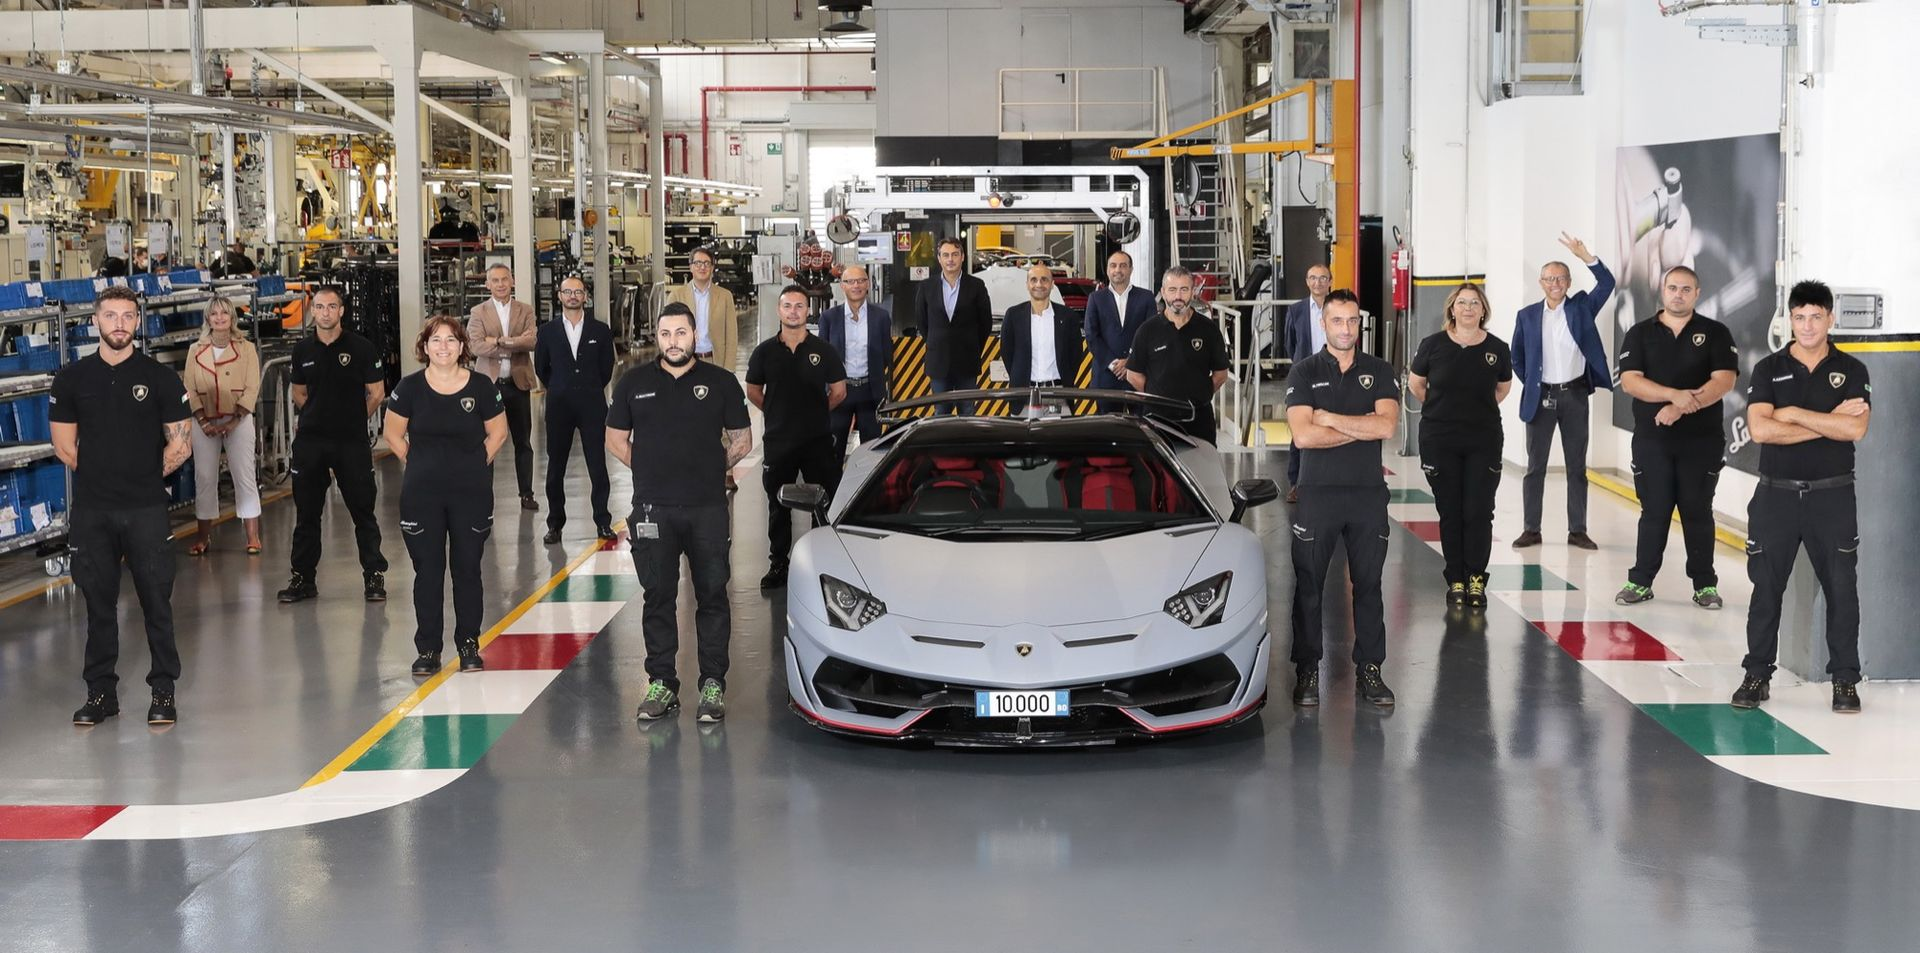 Tut i luren! Lamborghini har byggt 10.000 stycken Aventador